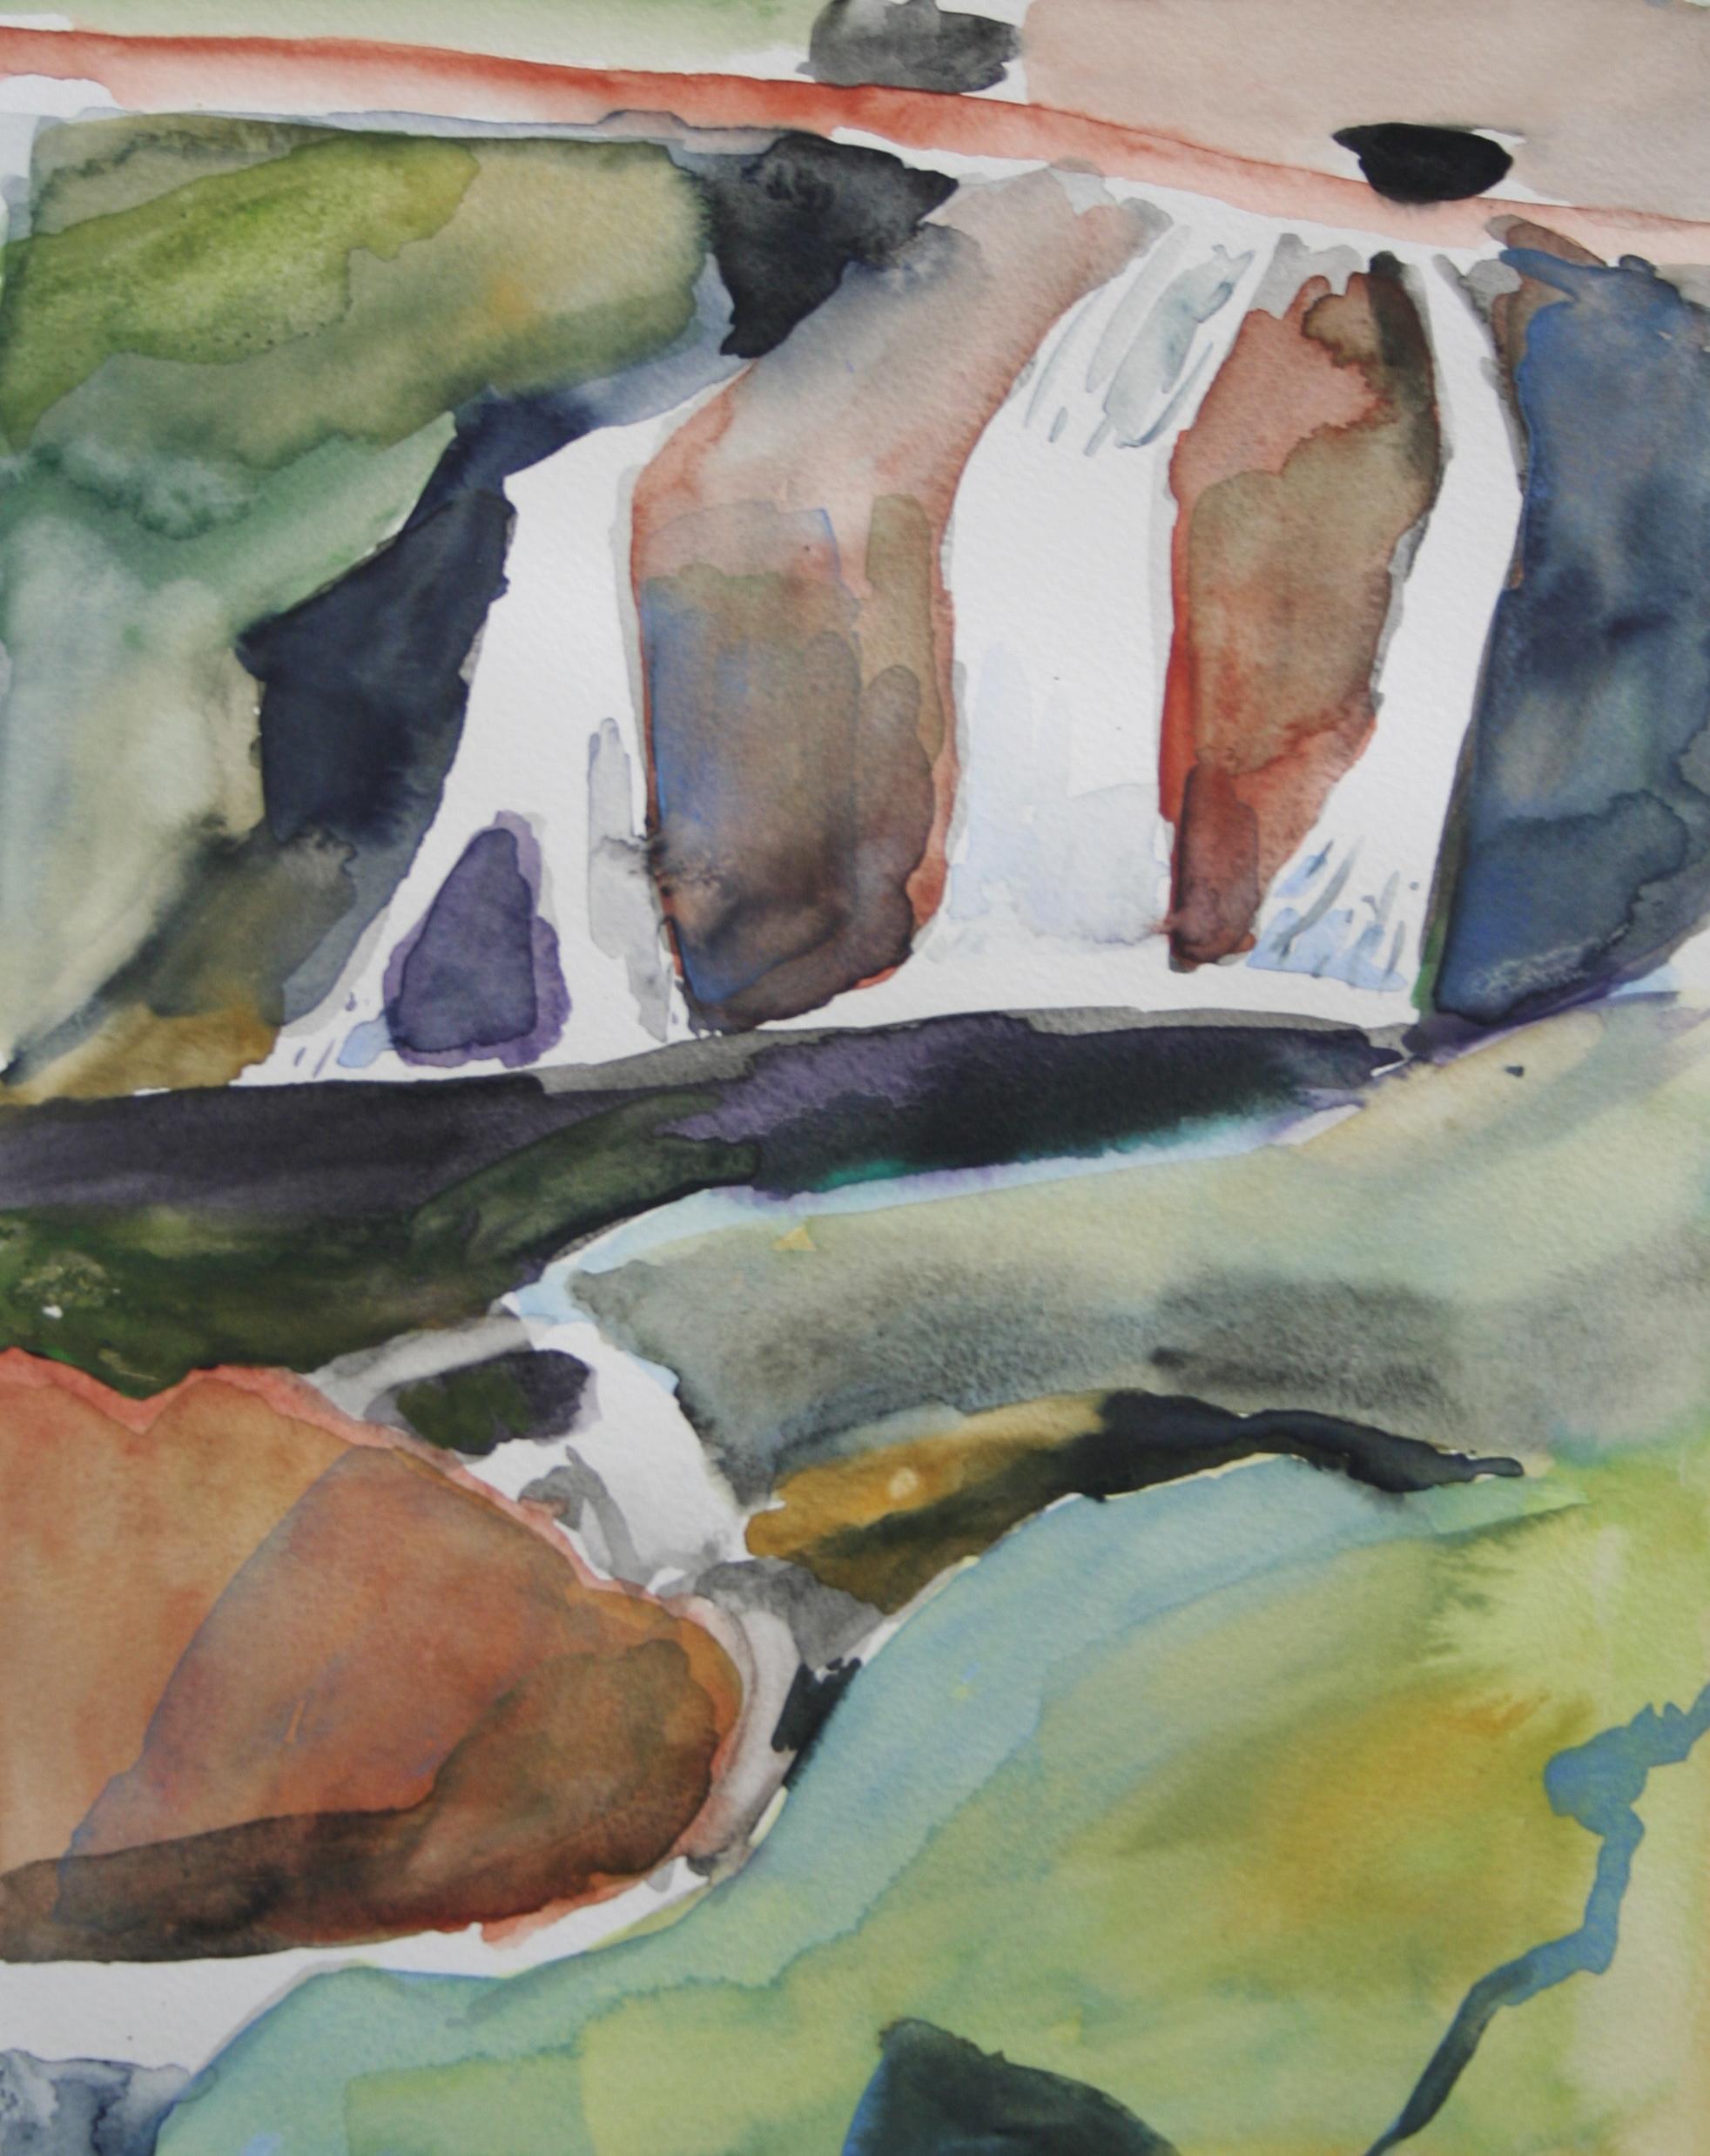 Waterfalls 2, Watercolor, 10.5 x 8 in, 2016